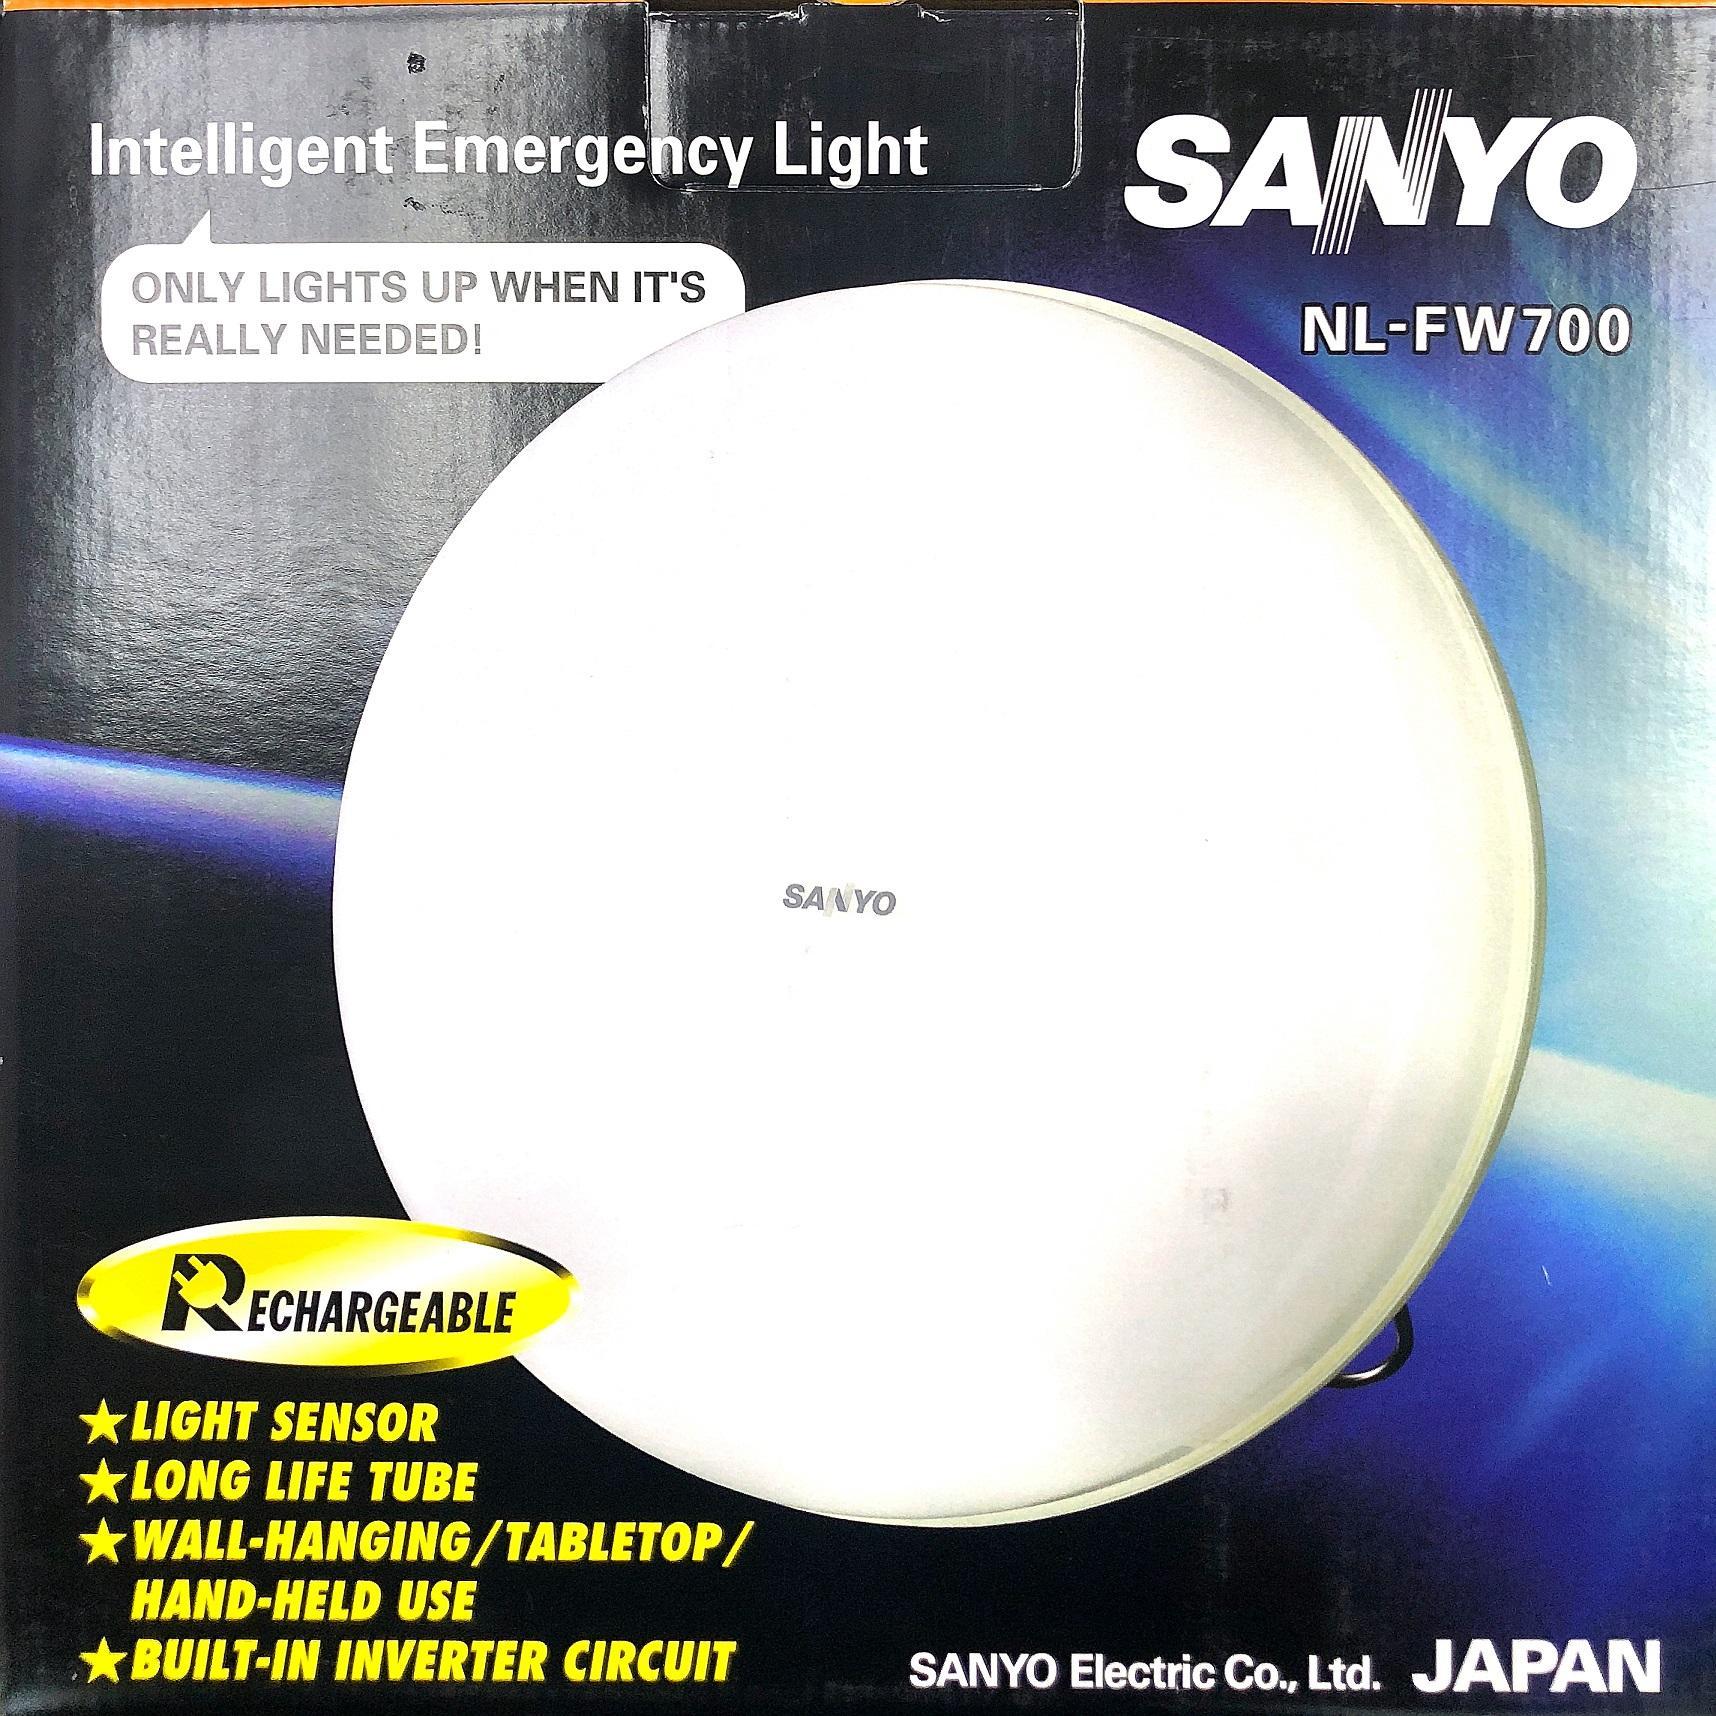 Sanyo NL-FW700 Intelligent Emergency Light